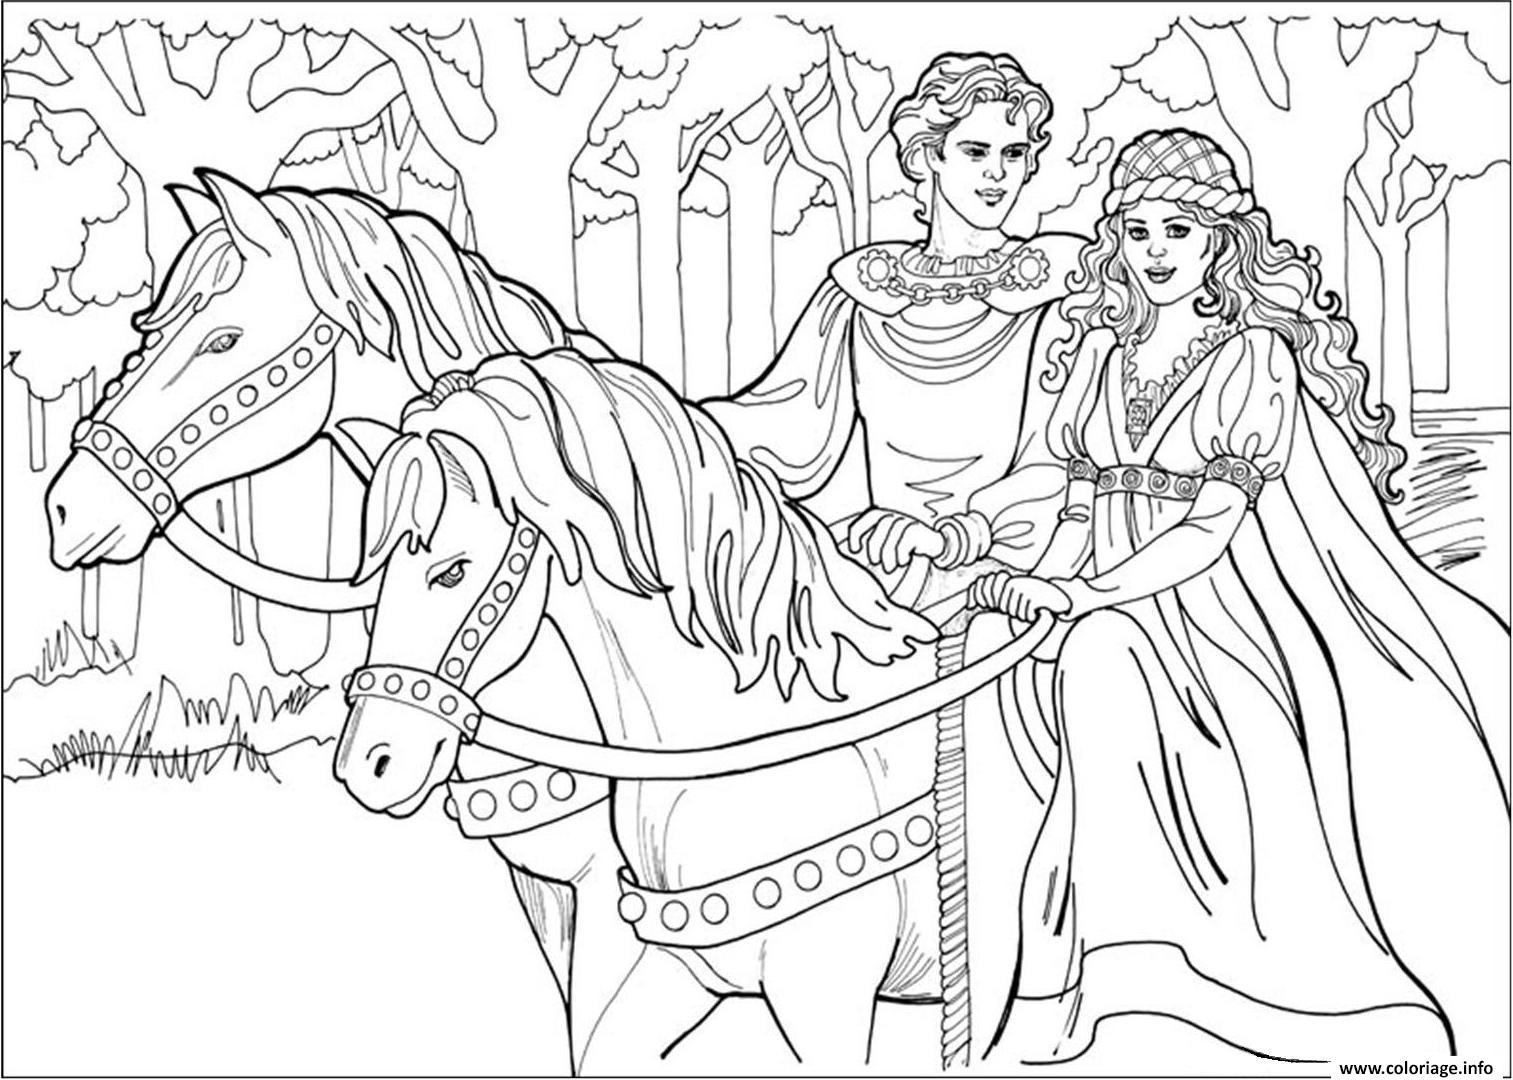 coloriage disney princesse 26 dessin imprimer - Princesse A Colorier